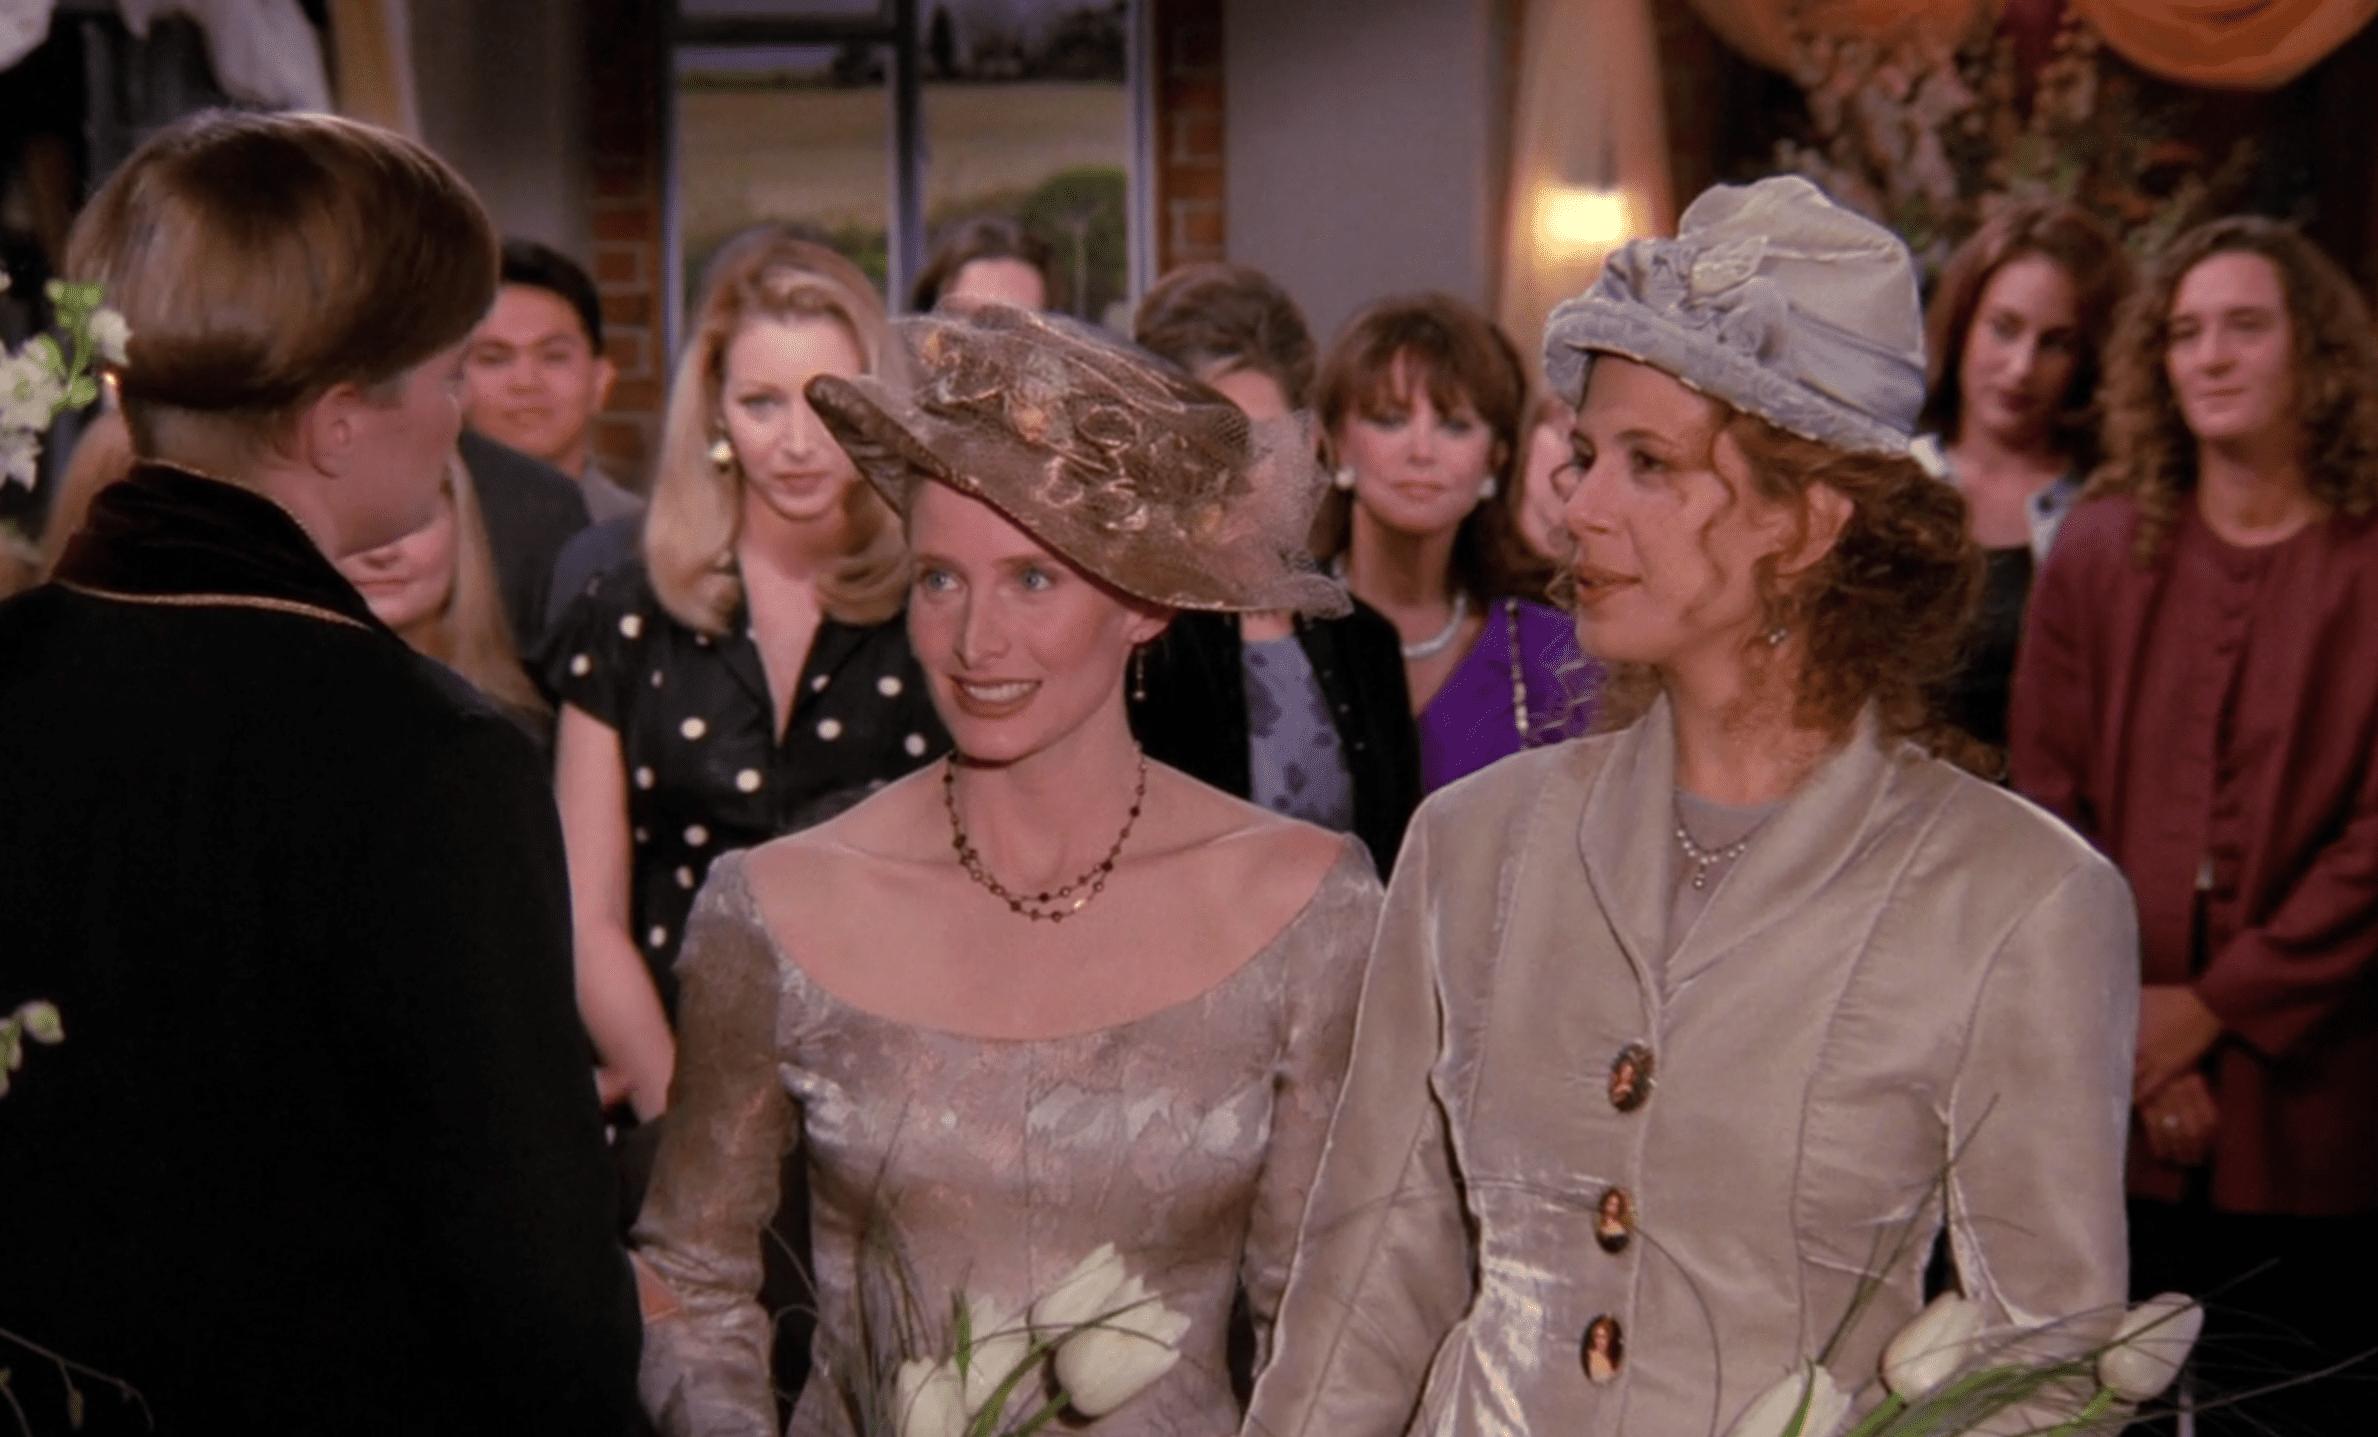 Carol and Susan's Wedding Friends